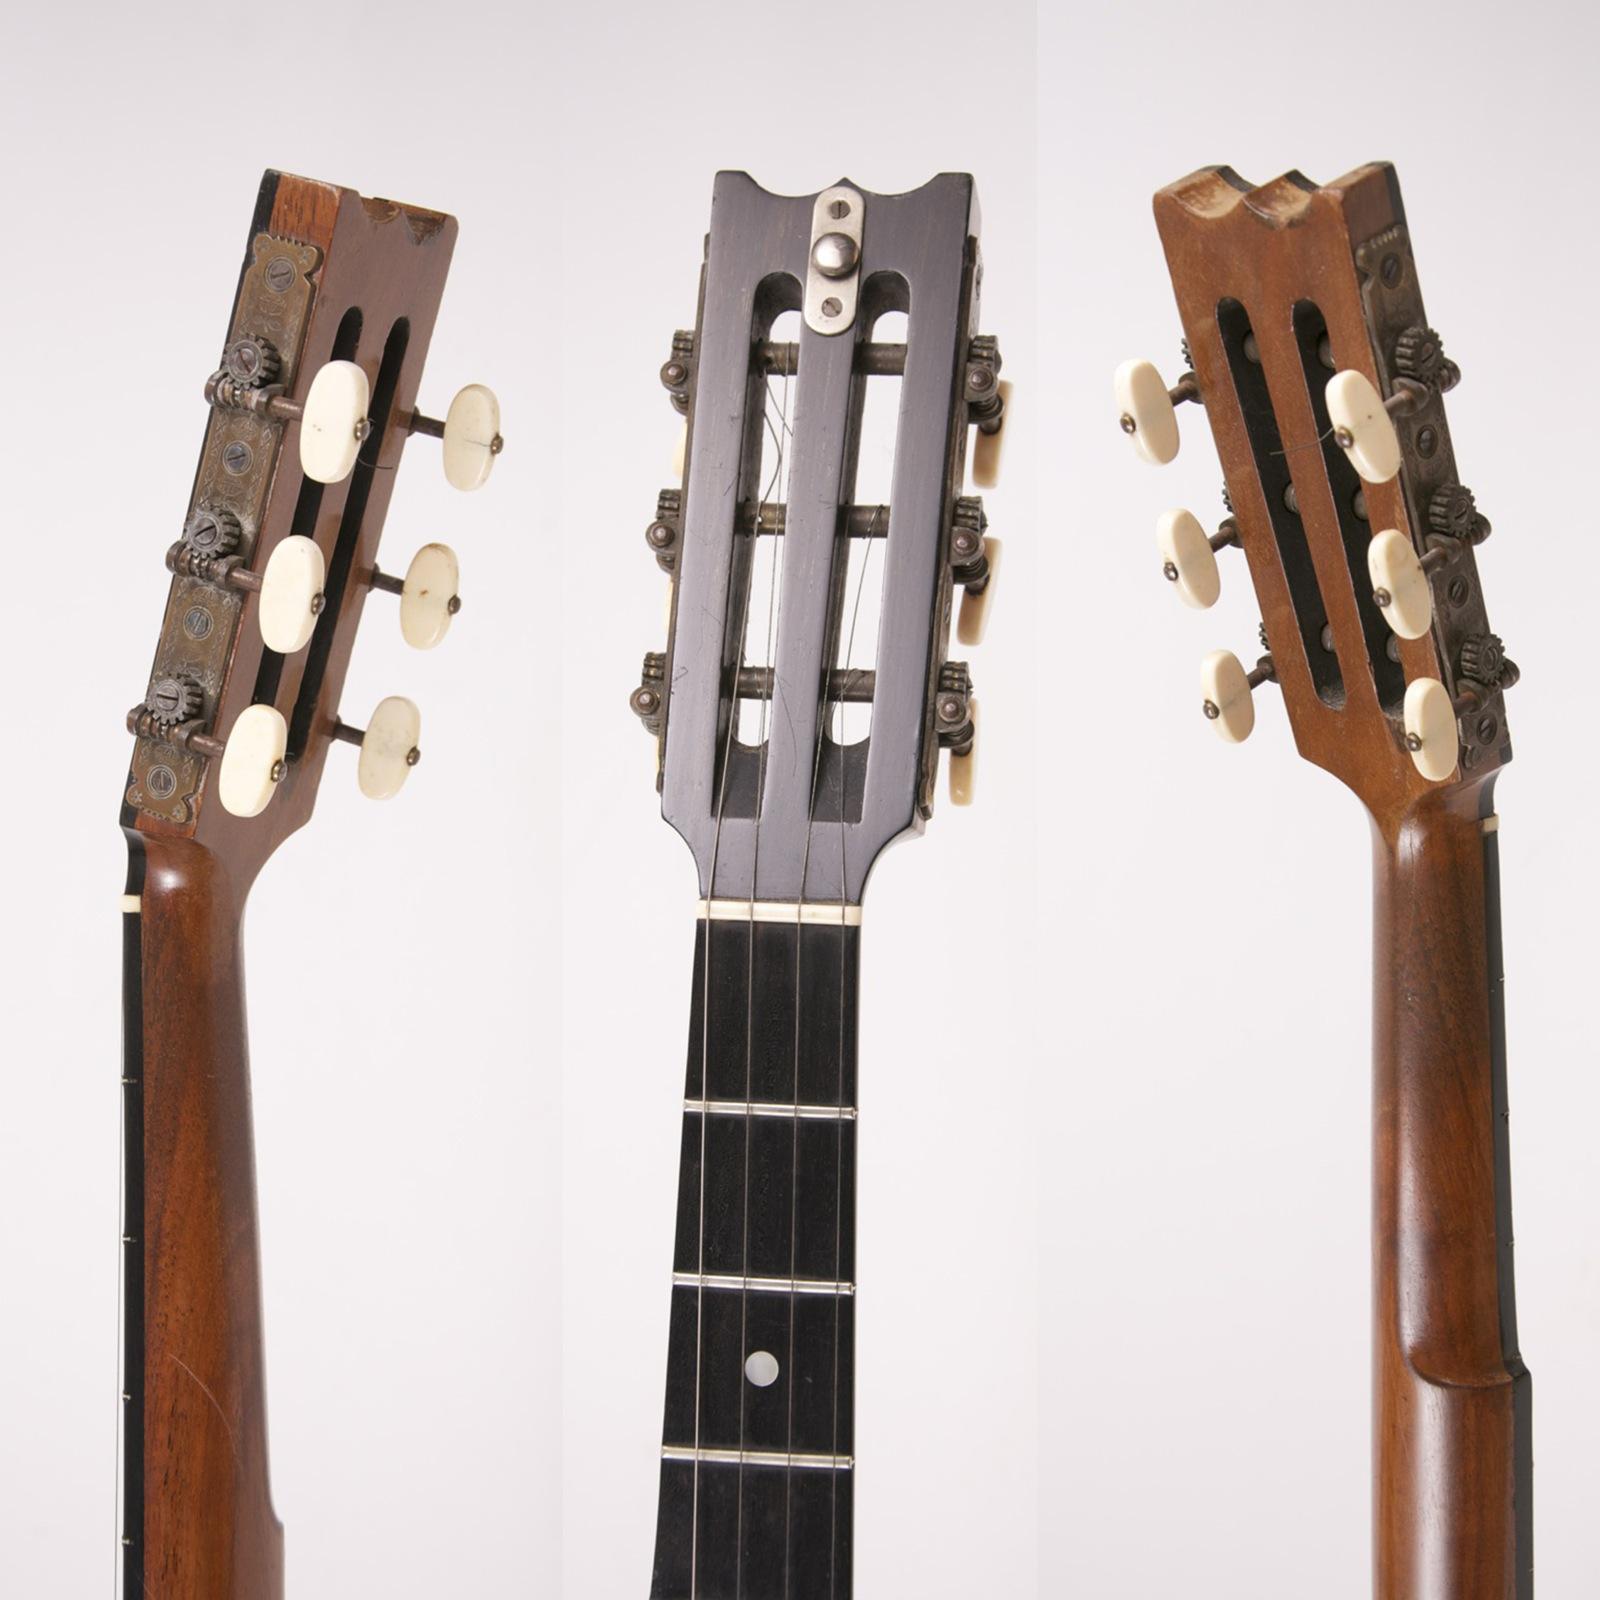 1872-banjo-A.-Wilmshurst-22